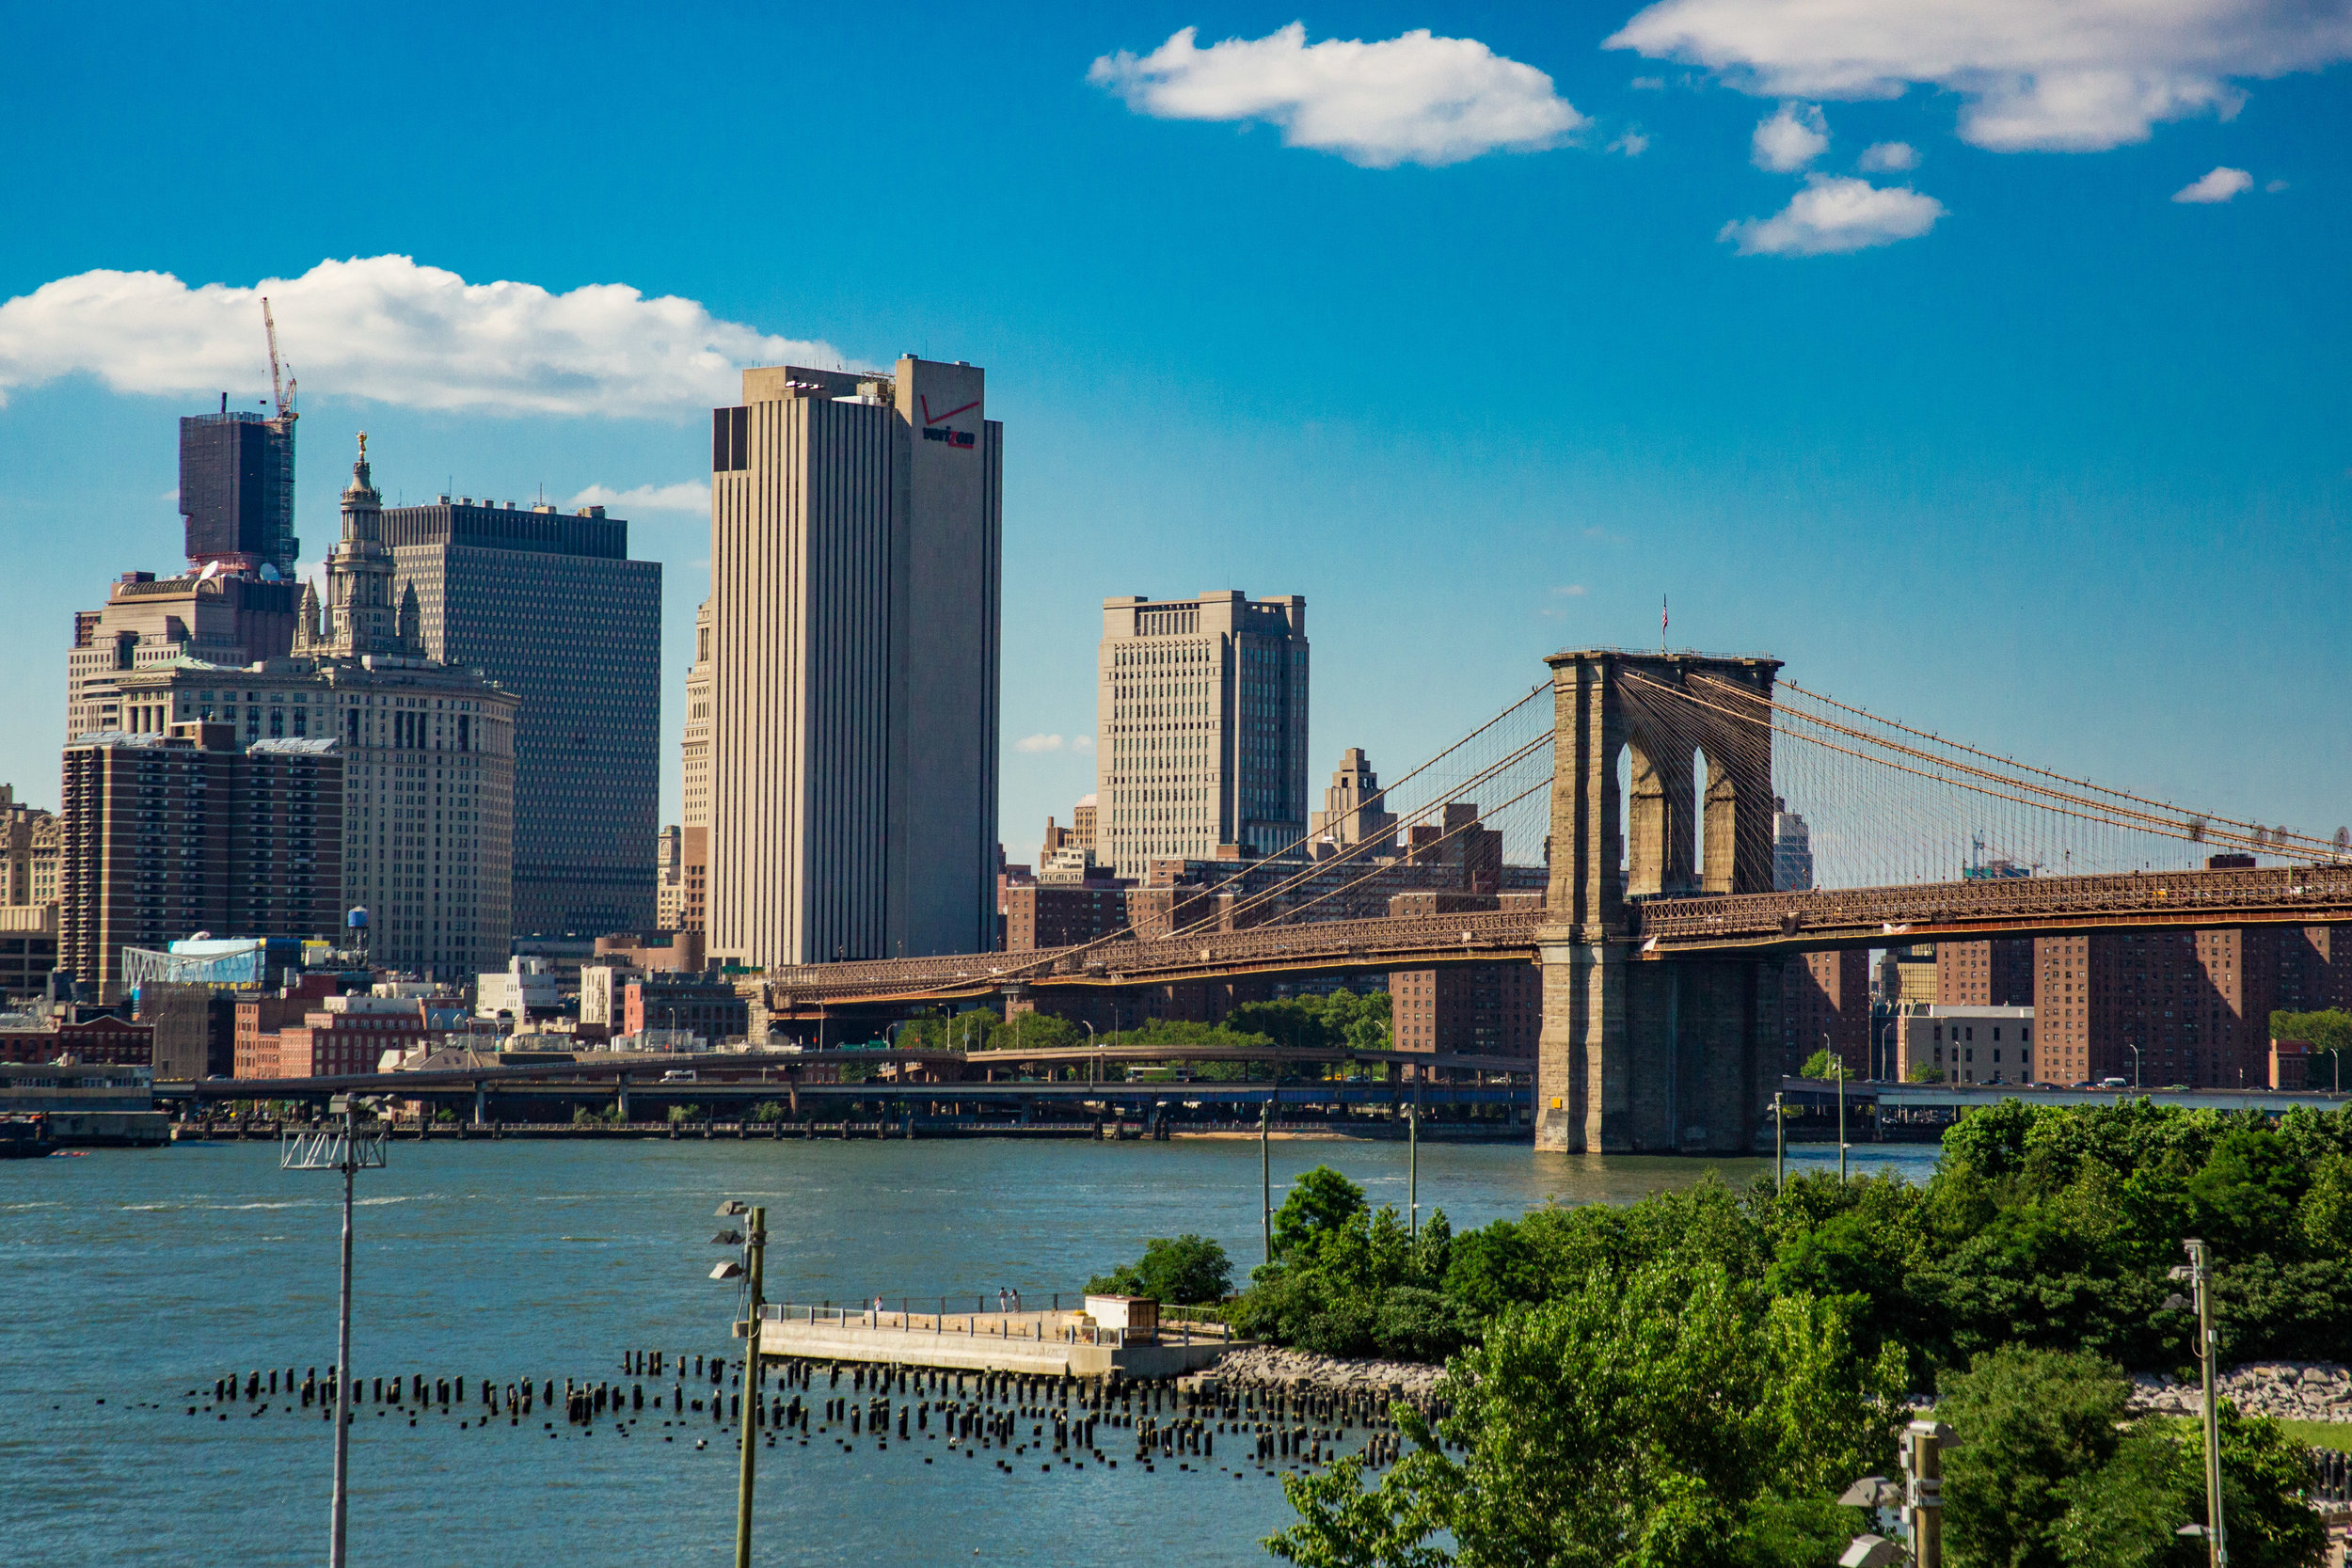 LSNY_Brooklyn_Bridge_Park-86.jpg